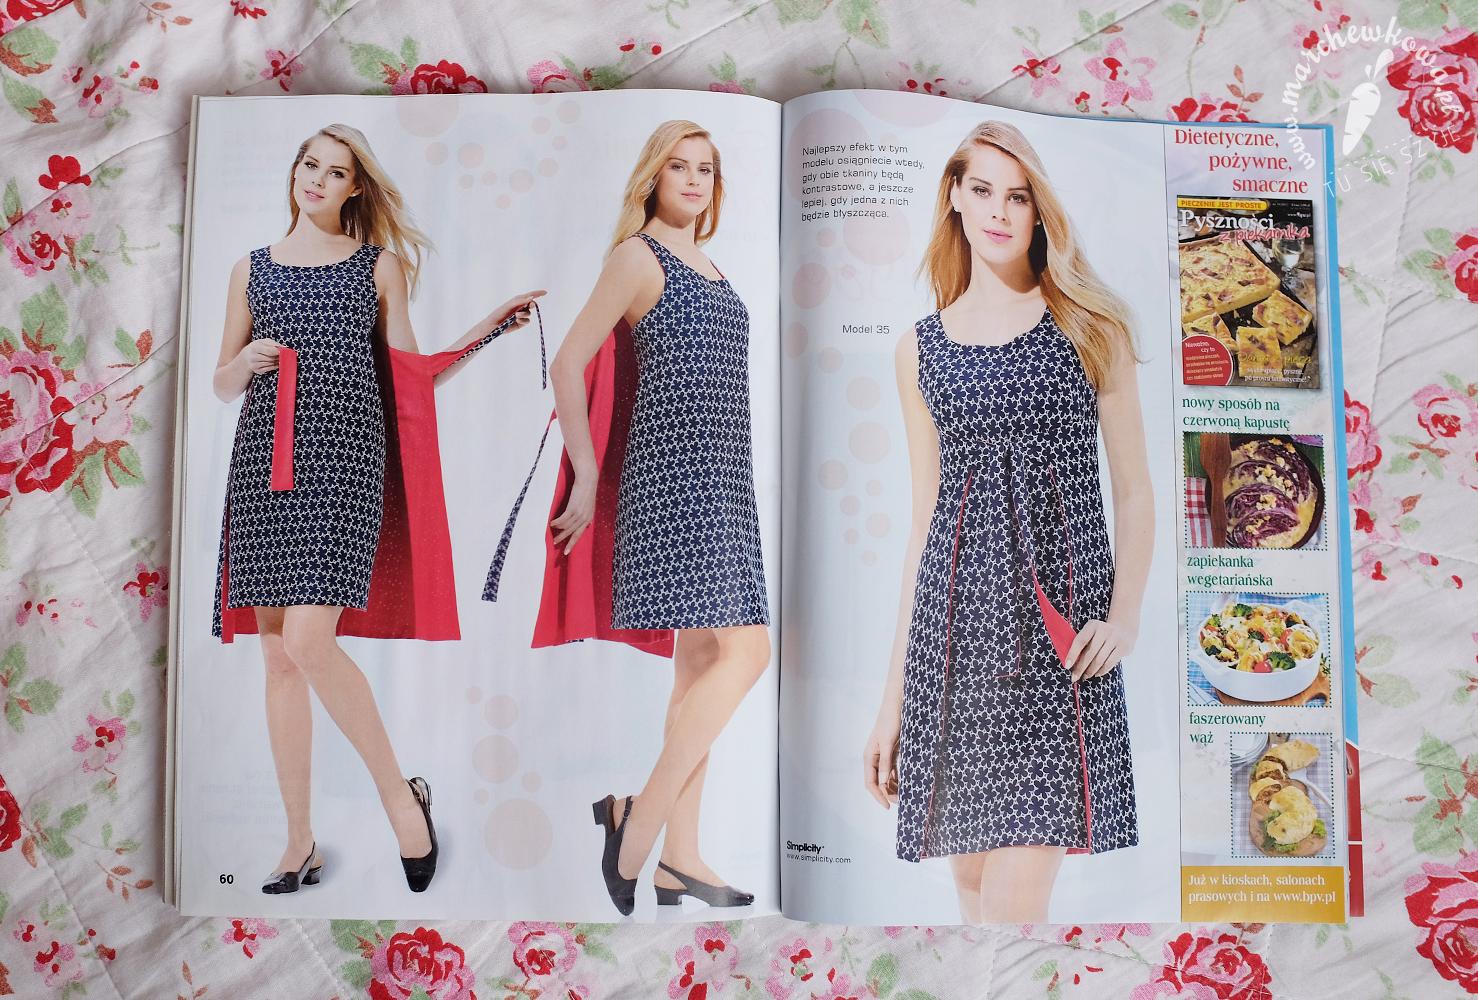 Anna Moda na szycie, Siplicity 1356, 8125, 1960s, retro, vintage dress, pattern